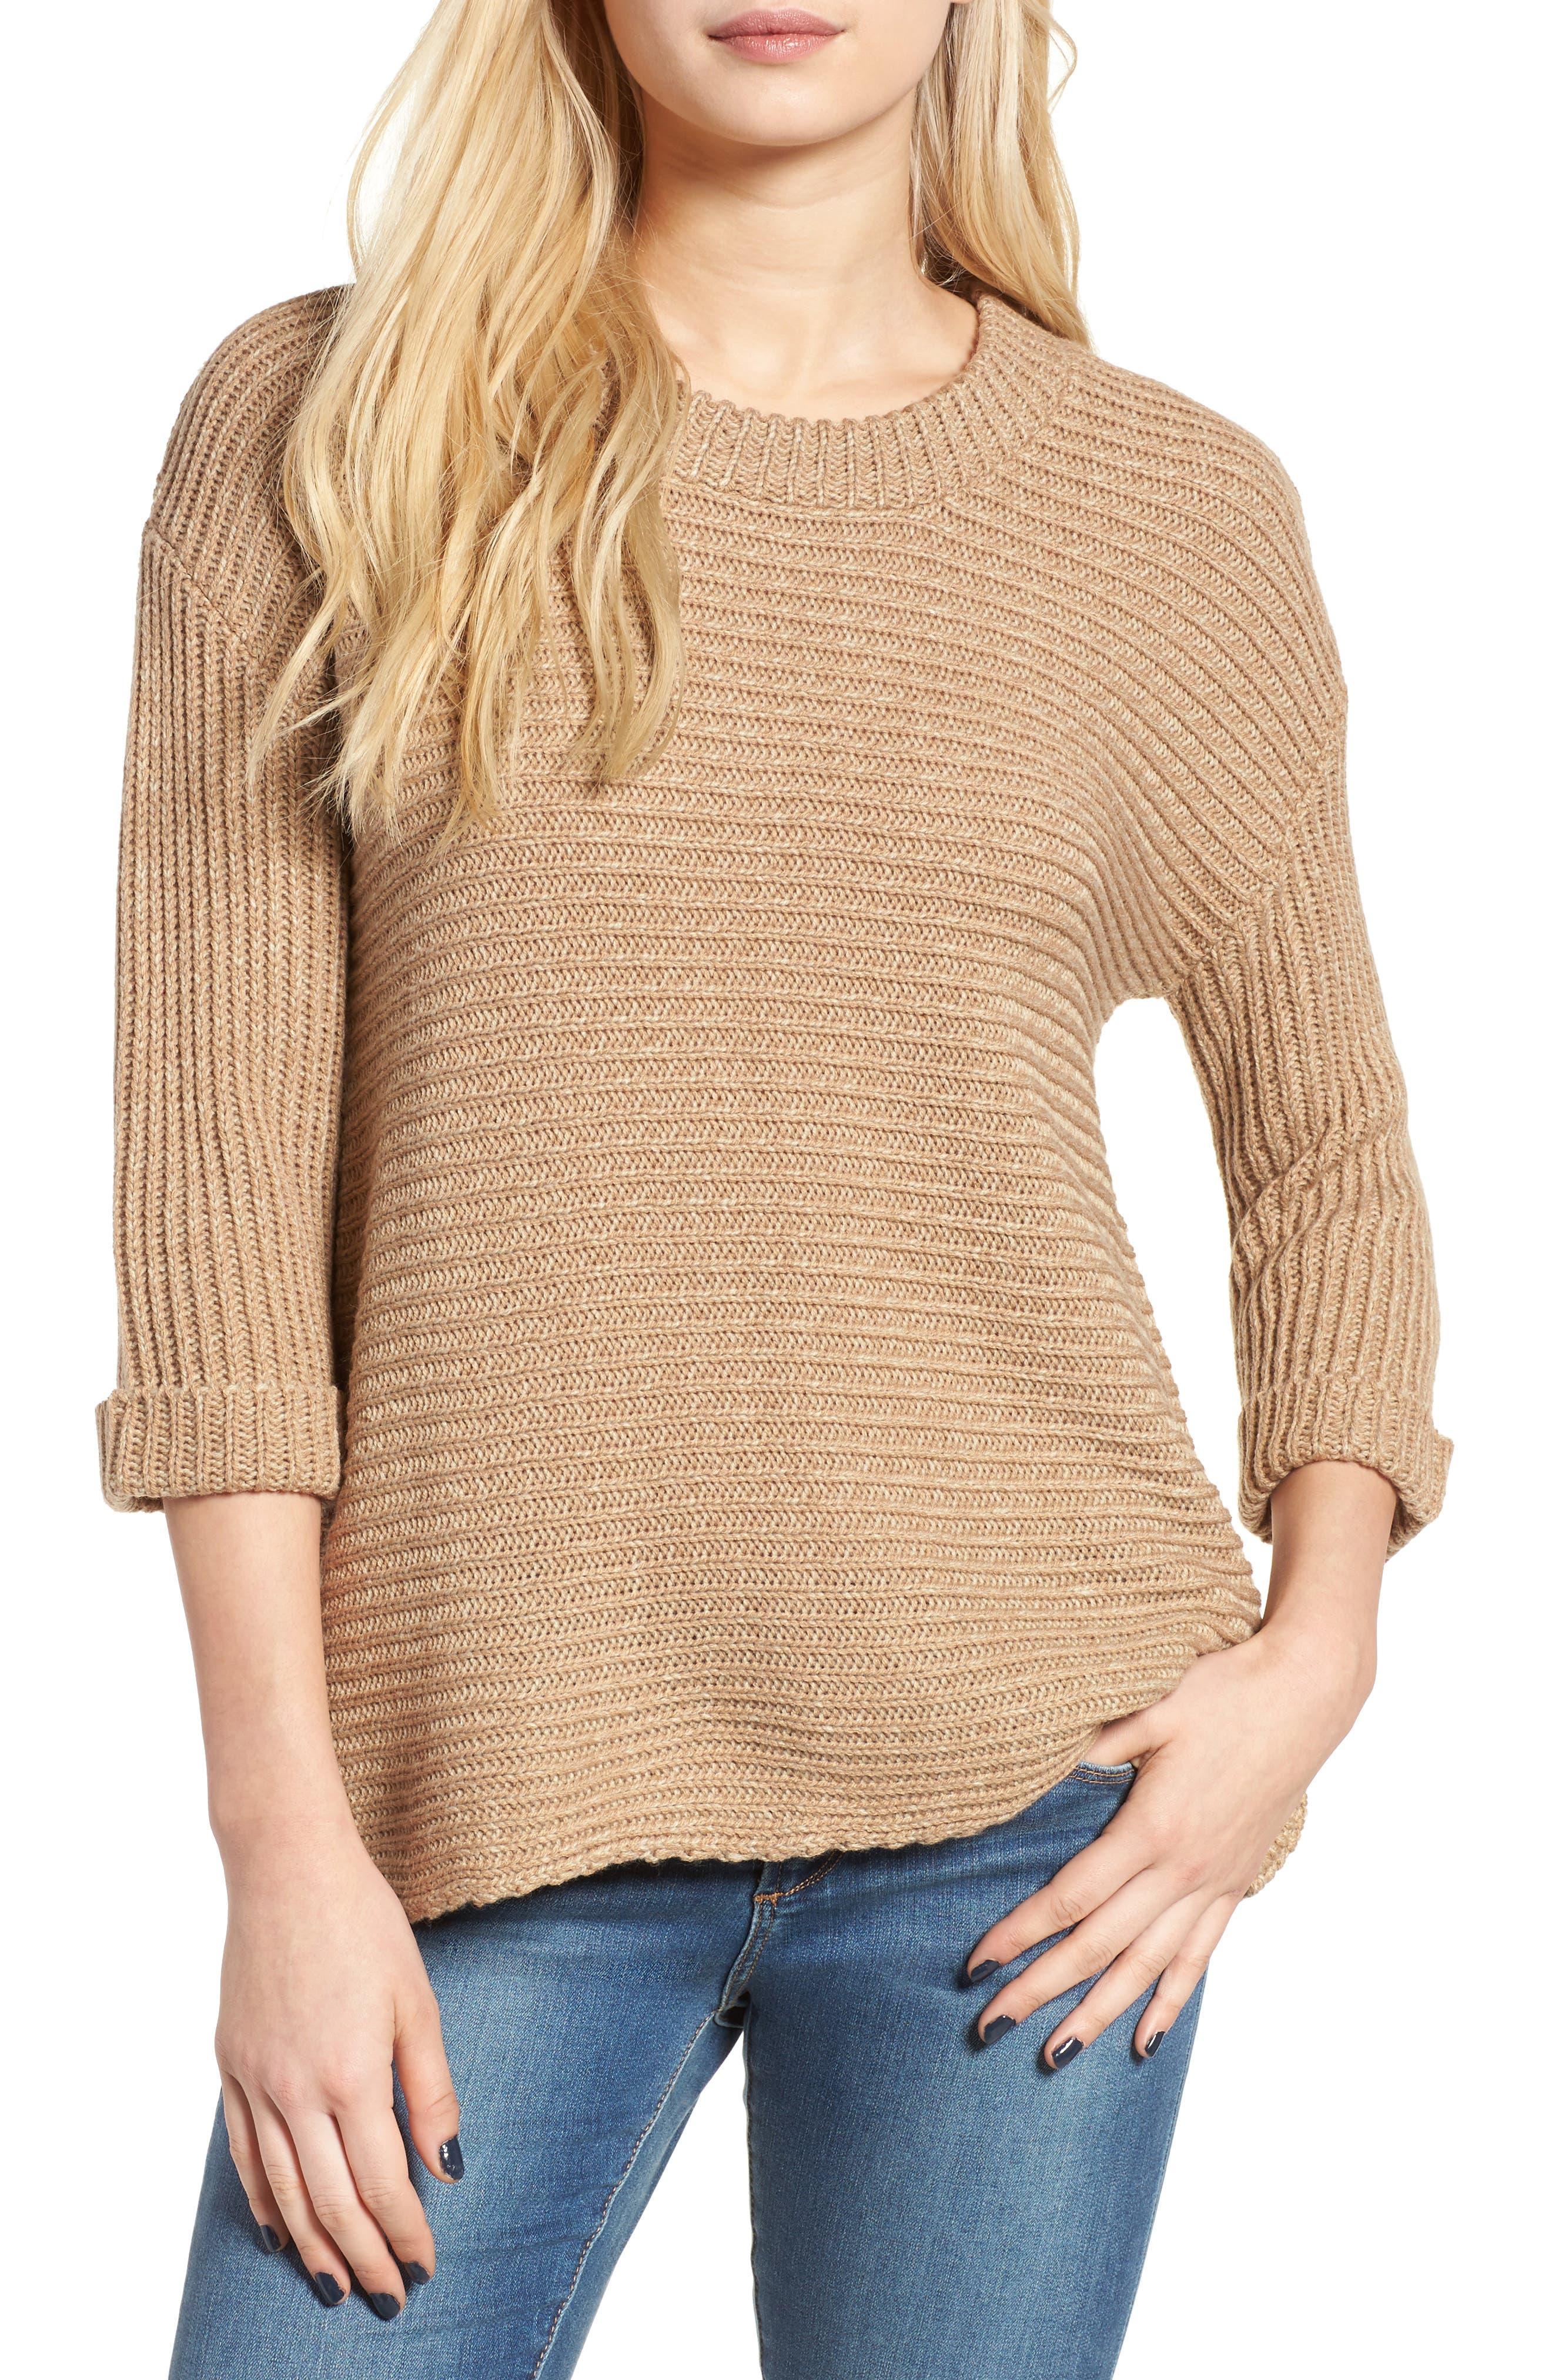 Alternate Image 1 Selected - Cotton Emporium Texture Knit Pullover